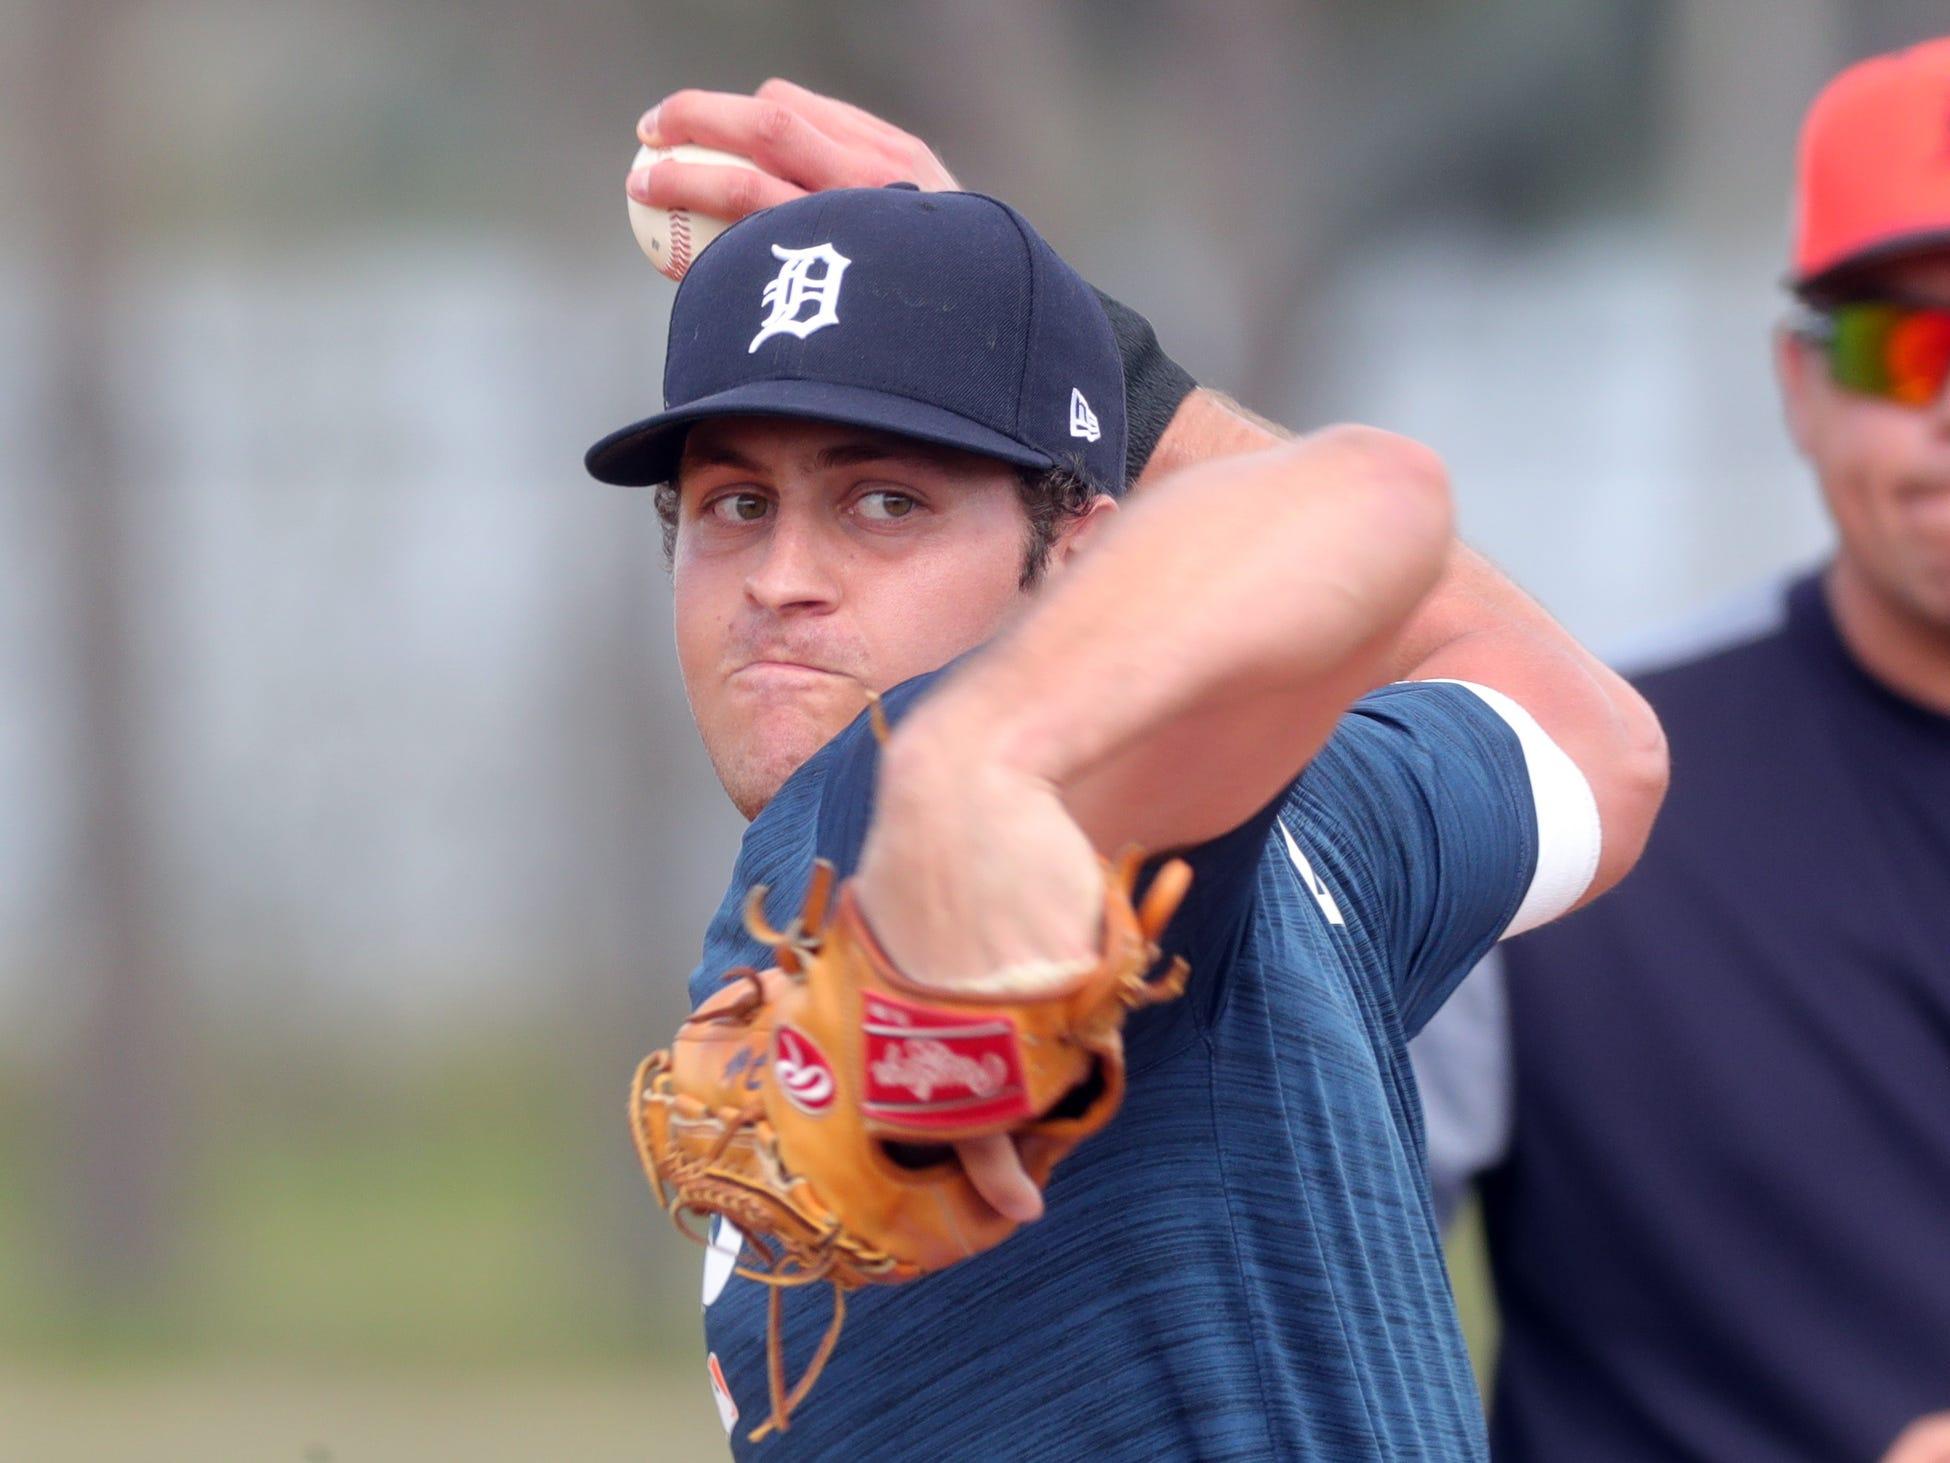 Tigers prospect Jason Foley throws batting practice during spring training on Wednesday, Feb. 20, 2019, at Joker Marchant Stadium in Lakeland, Fla.